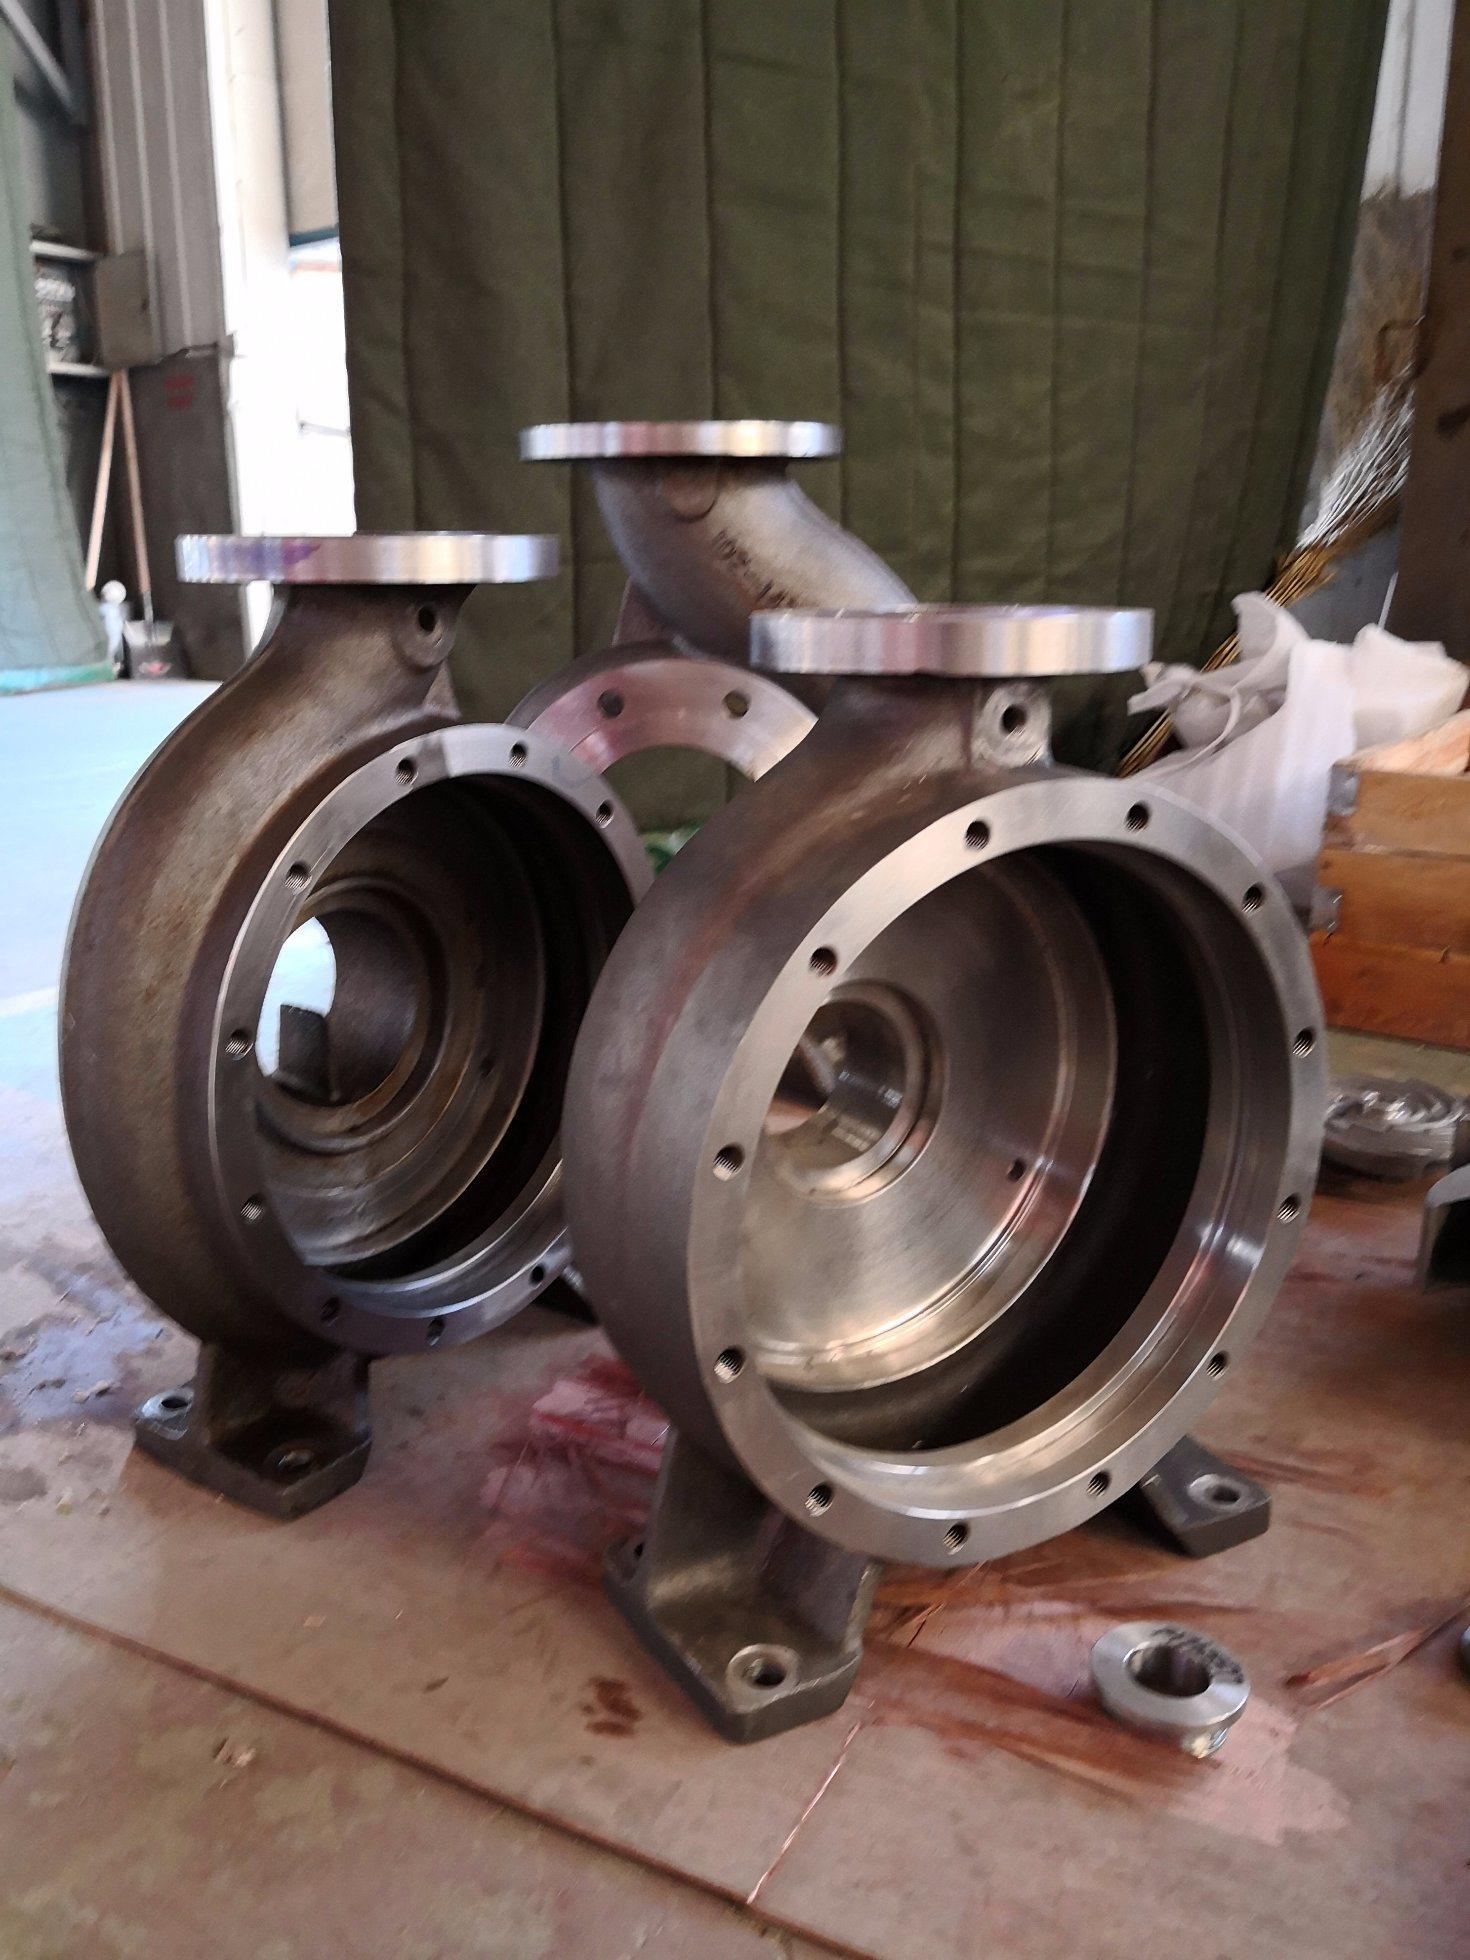 [Hot Item] Sulzer Pump Parts Ahlstrom Casing Cover EPP54-300